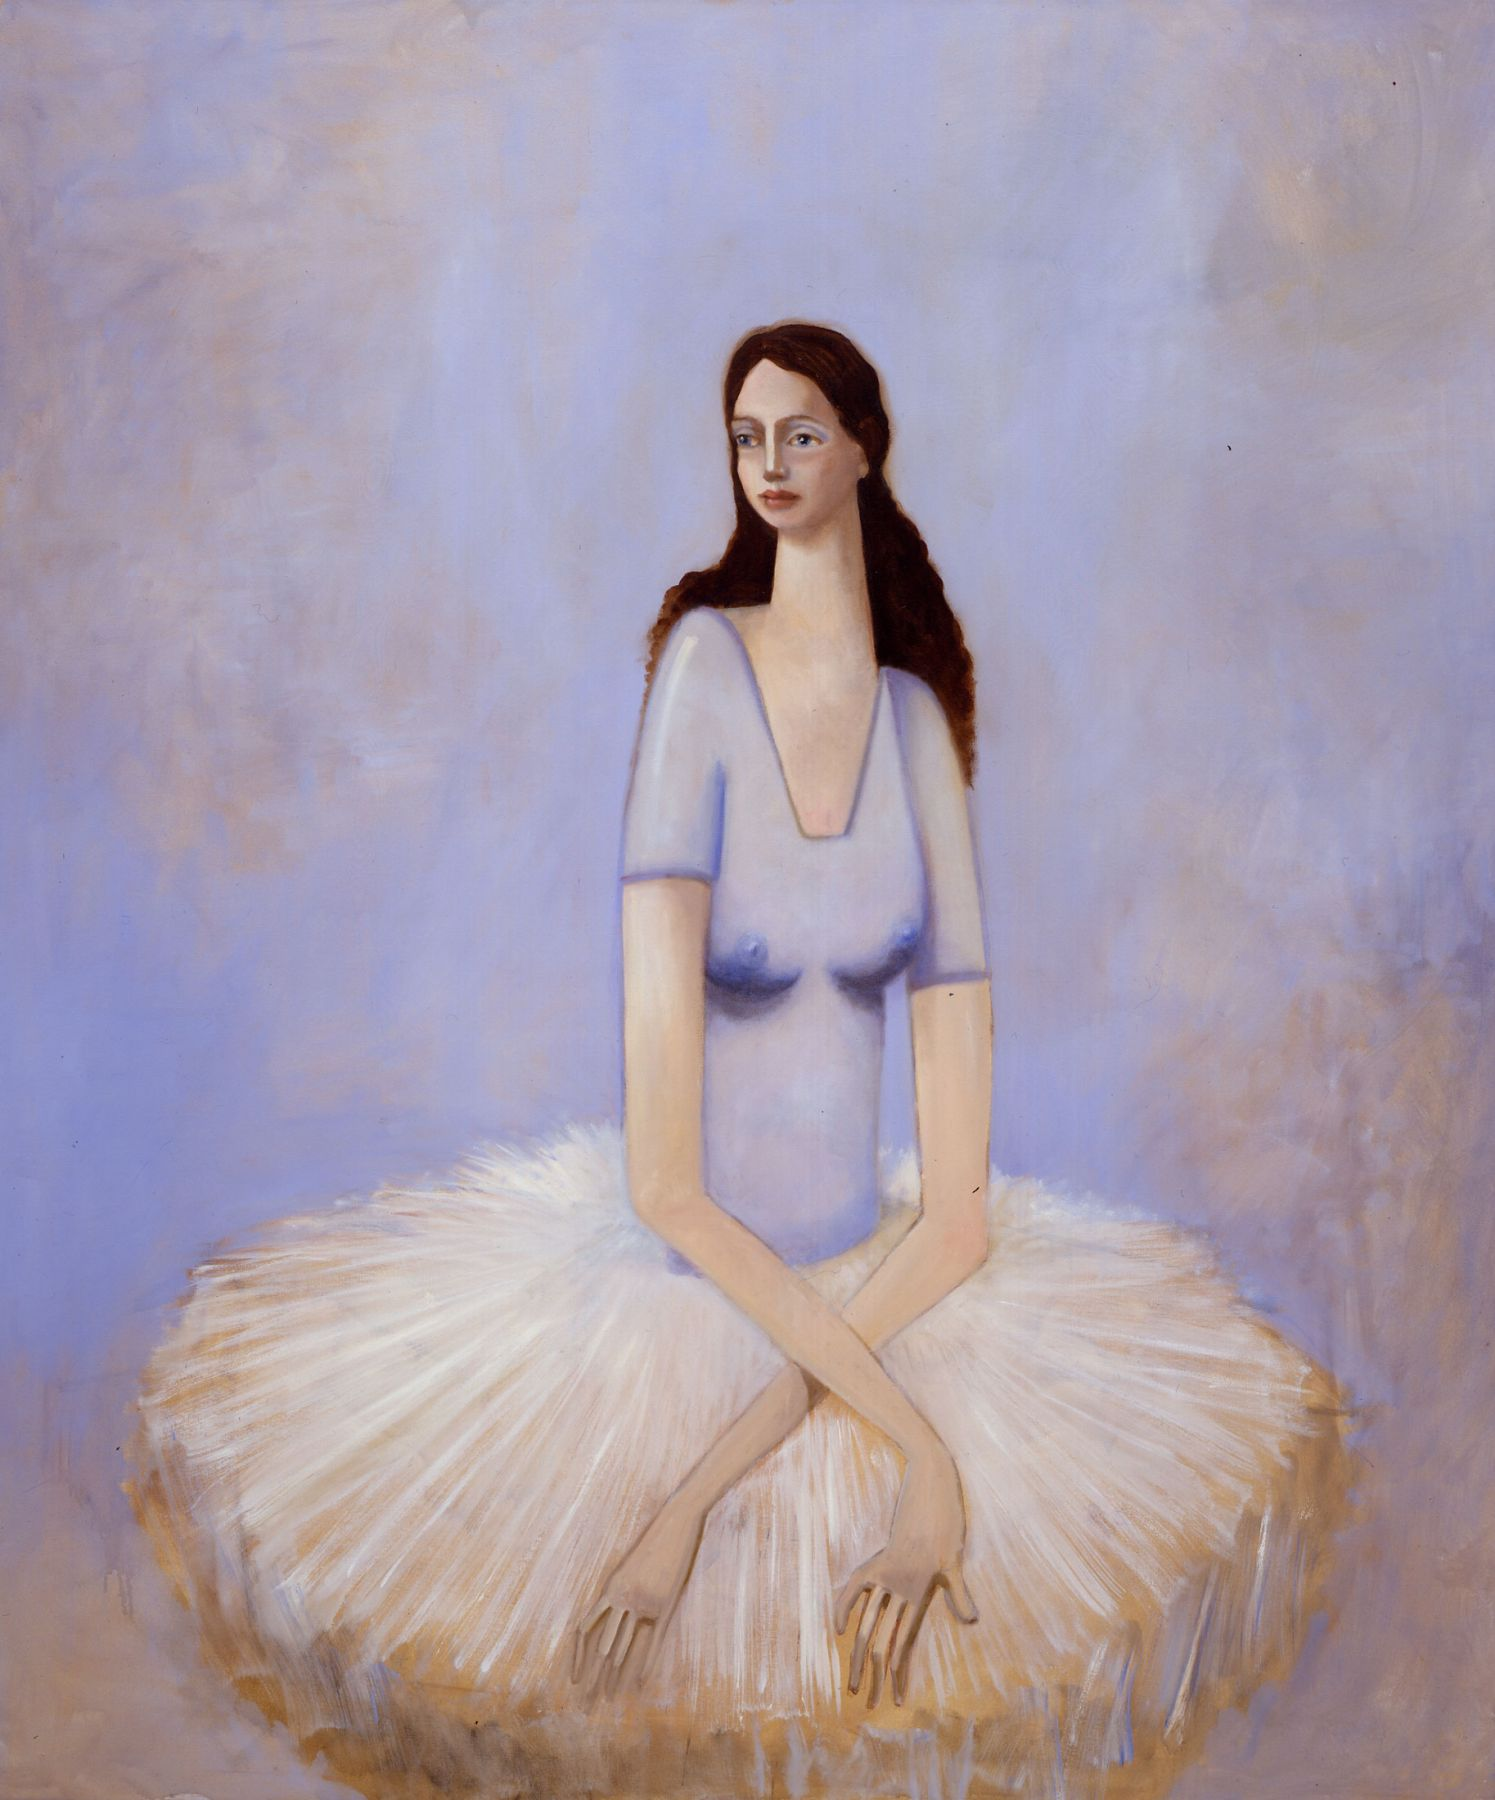 George Condo Ballerina, 2002